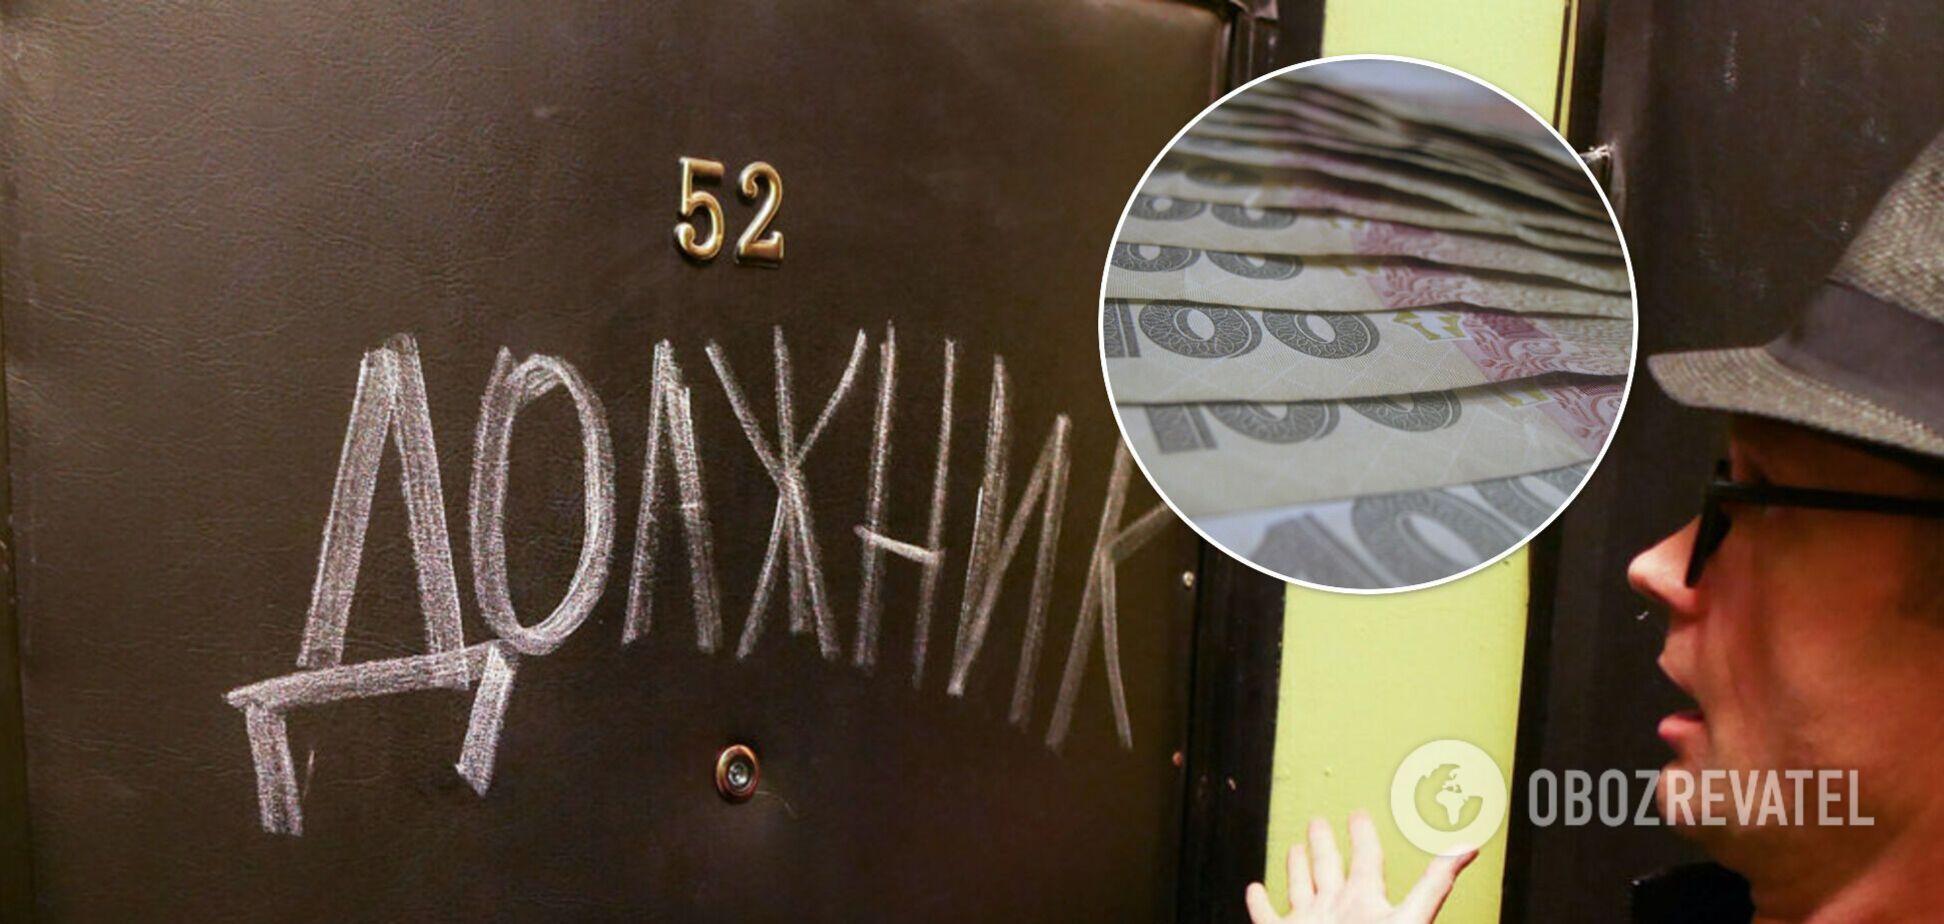 ПриватБанк натравил коллекторов на клиента из-за 69 гривен долга